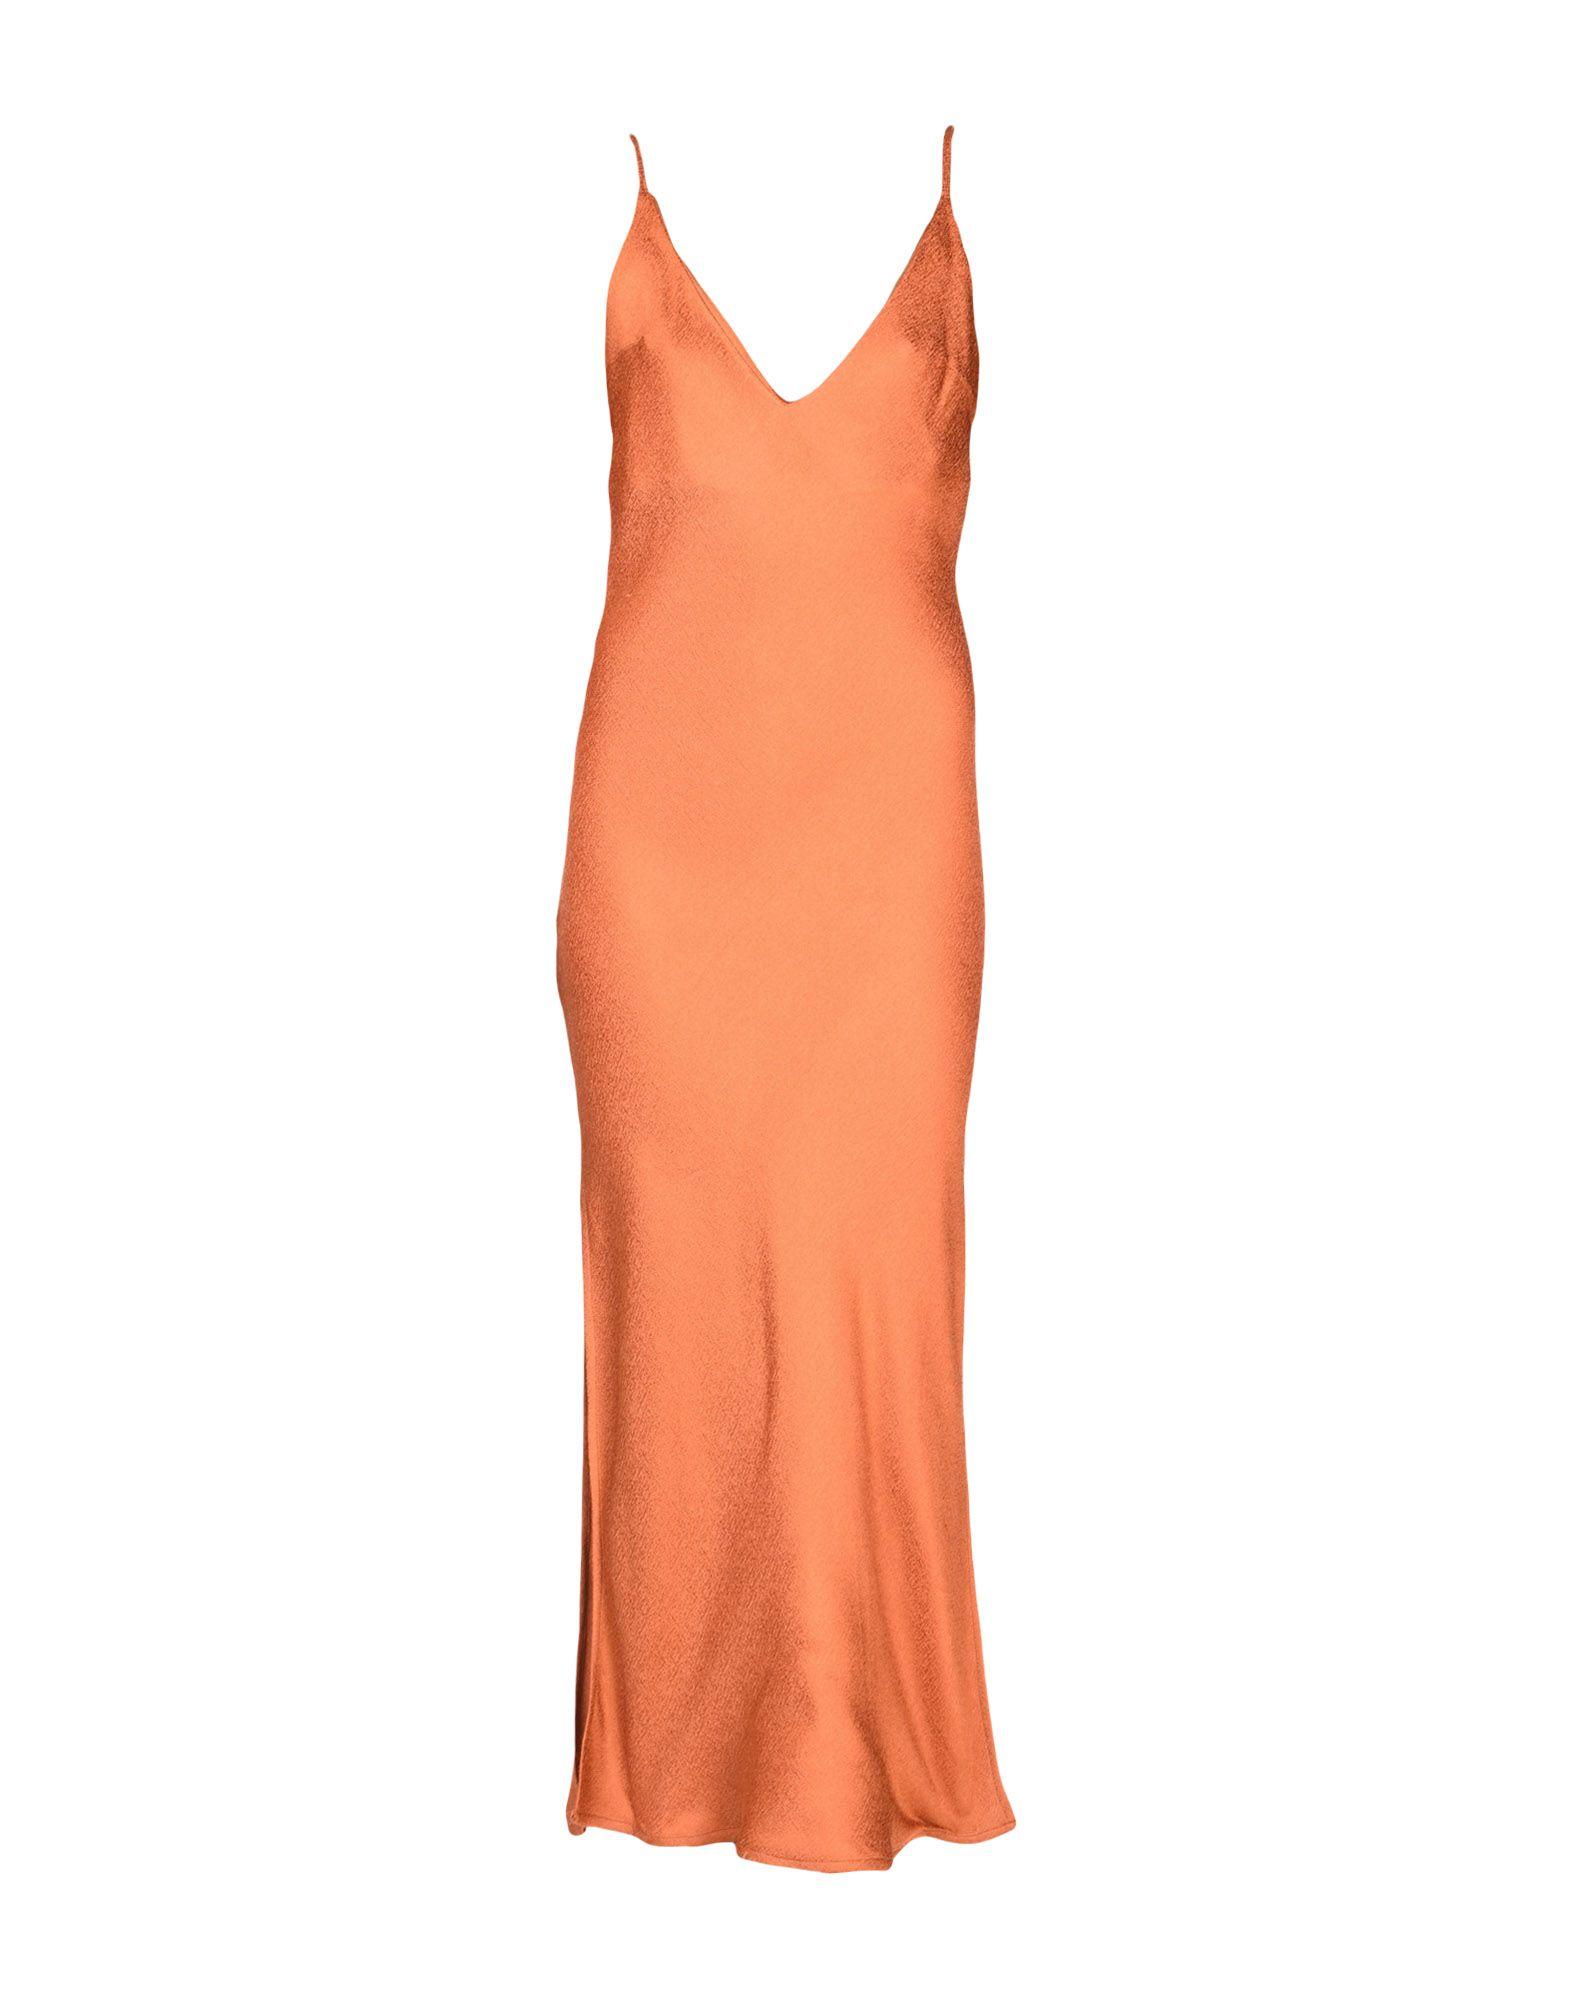 TONELLO Длинное платье skin block model skin section model human skin anatomical model